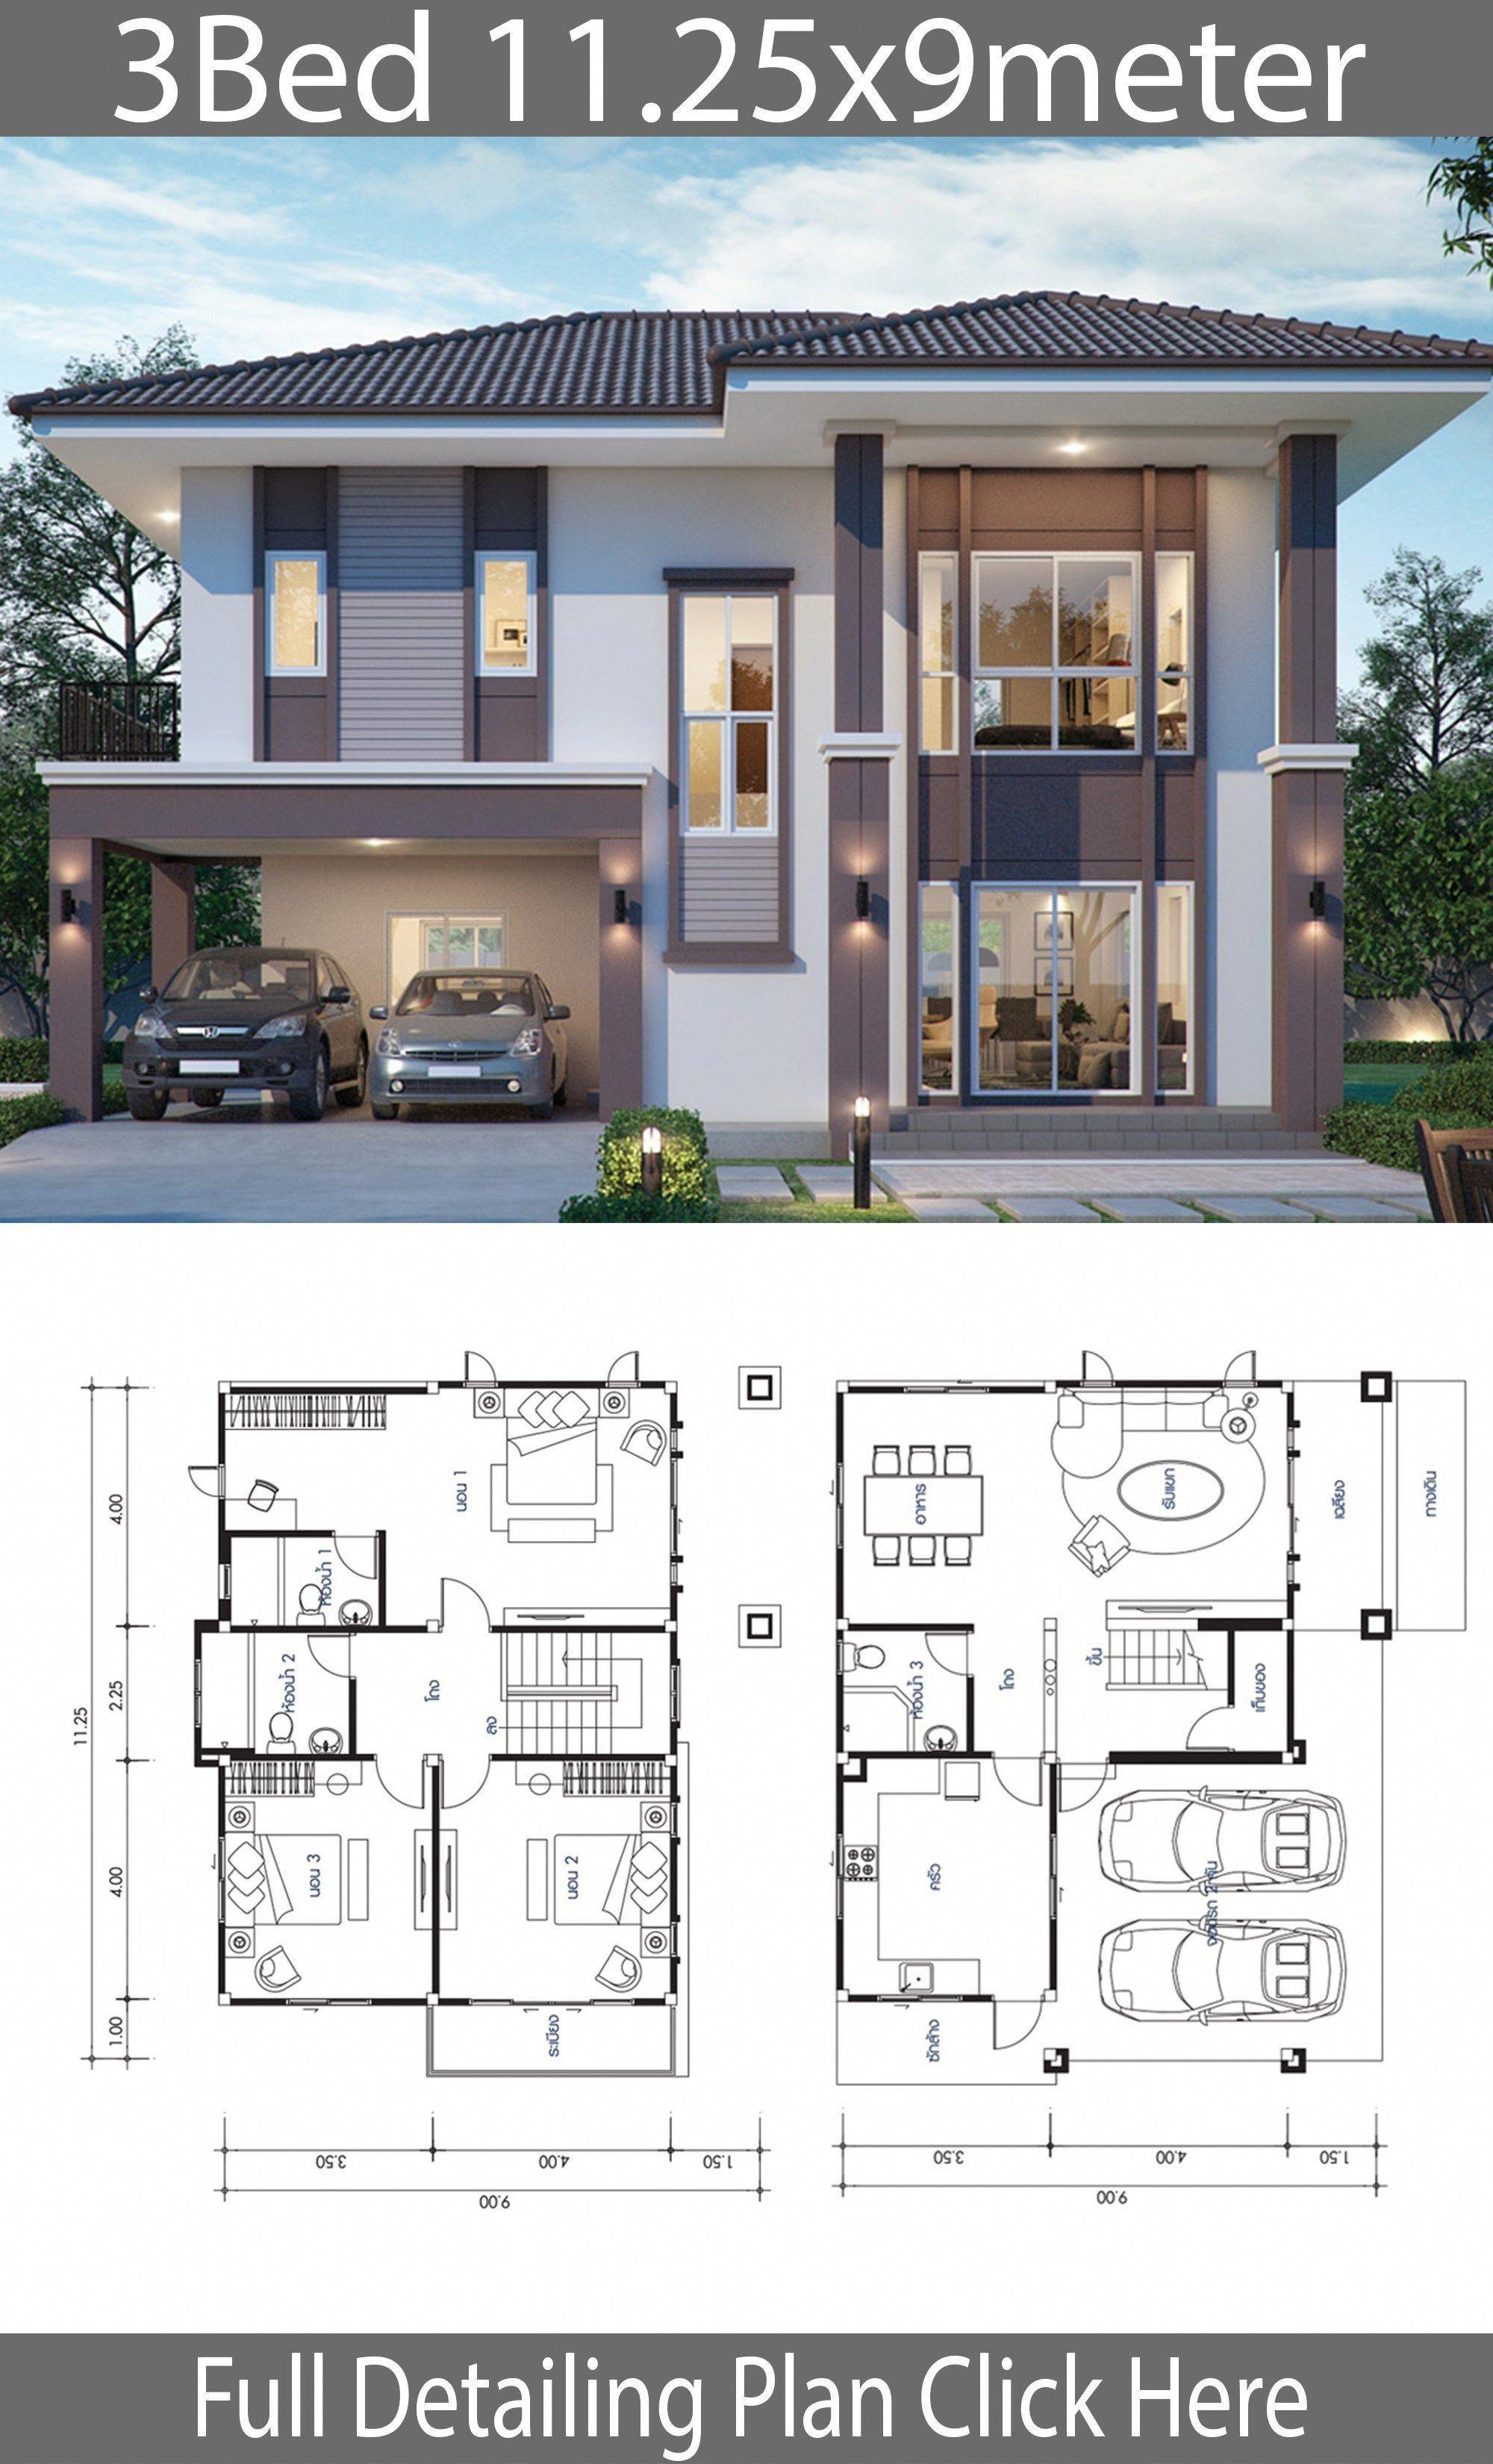 3 Storey Modern House Floor Plans House Plans 8x18m With 4 Bedrooms Gedangrojo Best In 2020 Modern House Plans House Construction Plan 3 Storey House Design